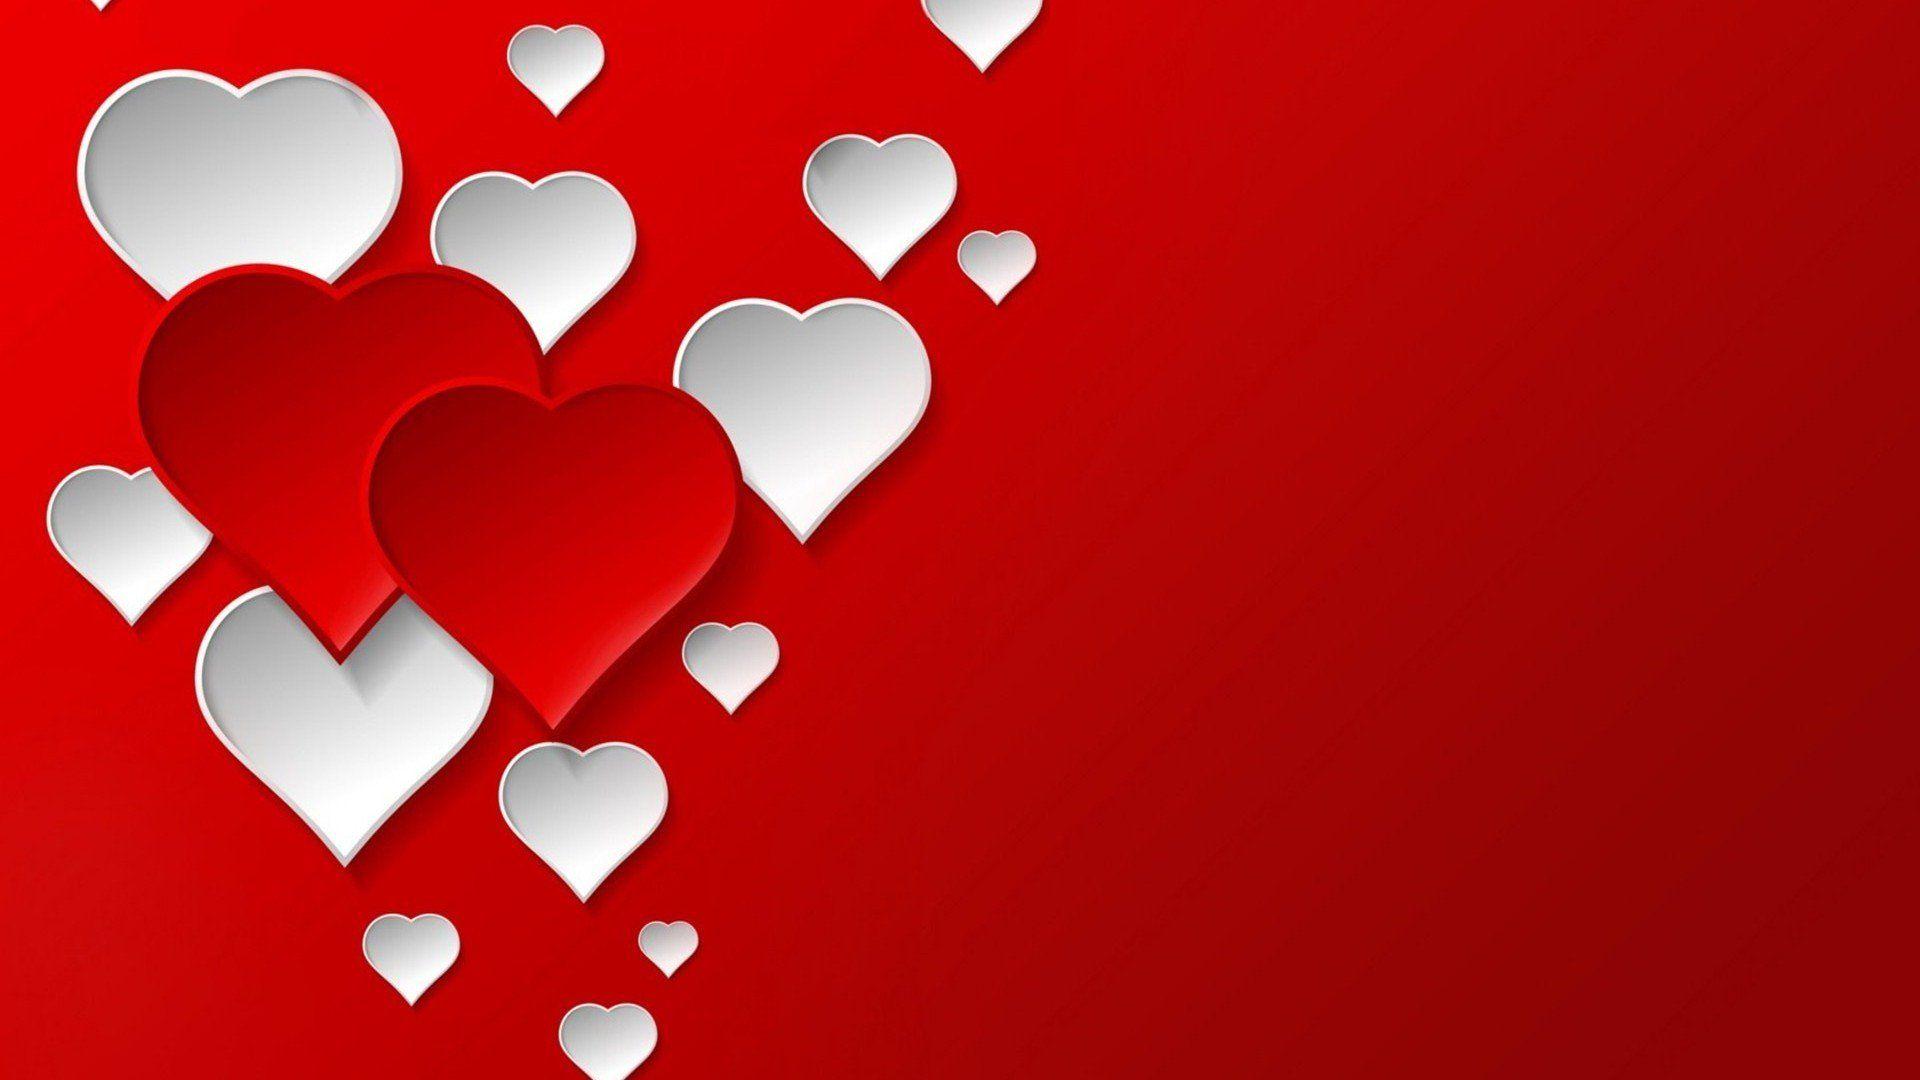 Heart laptop background